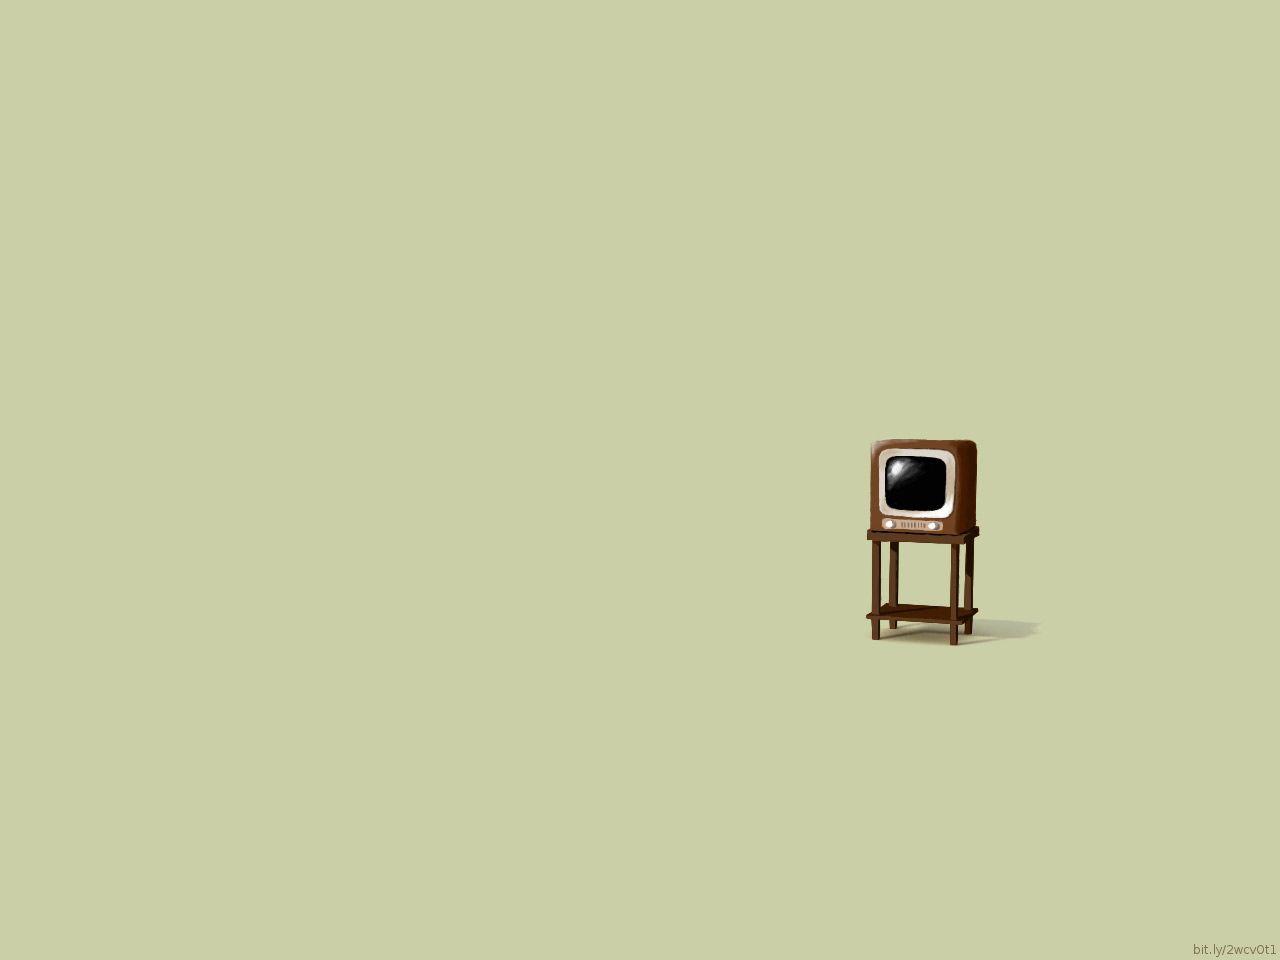 Retro TV Minimalist desktop wallpaper Desktop wallpaper simple 1280x960